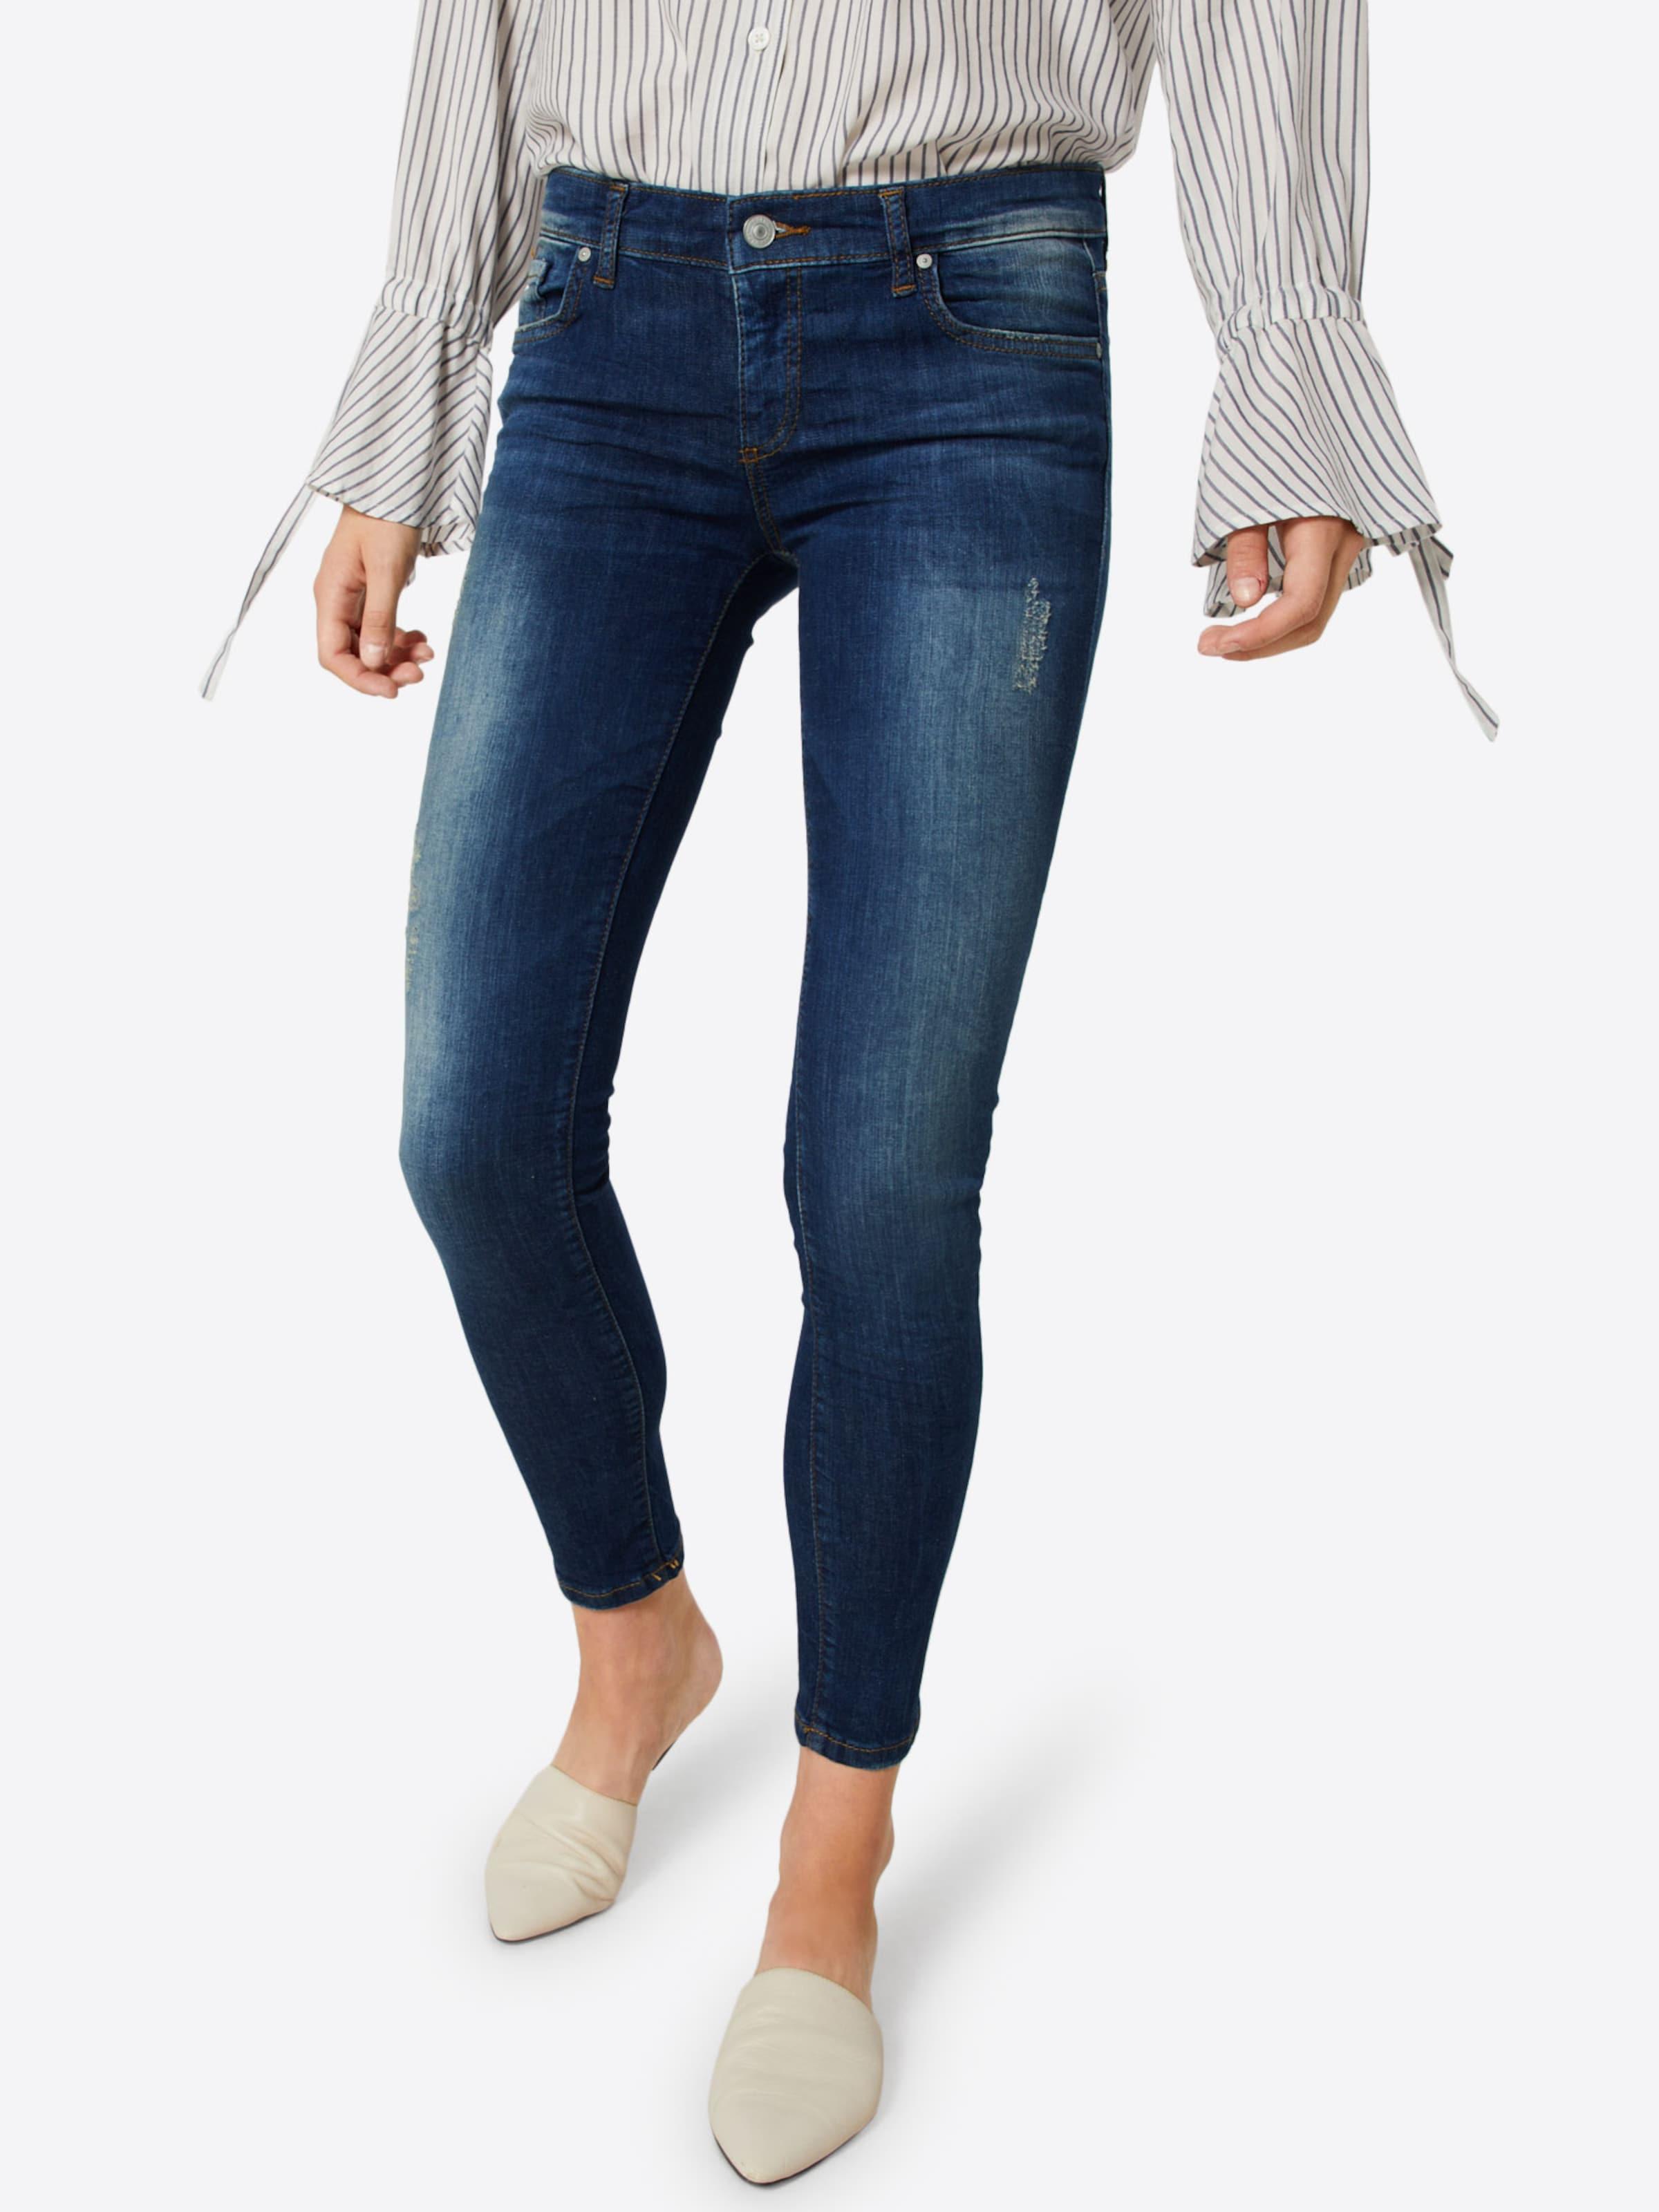 8 'mina' 7 Blau skinny Jeans Ltb In A53RjL4